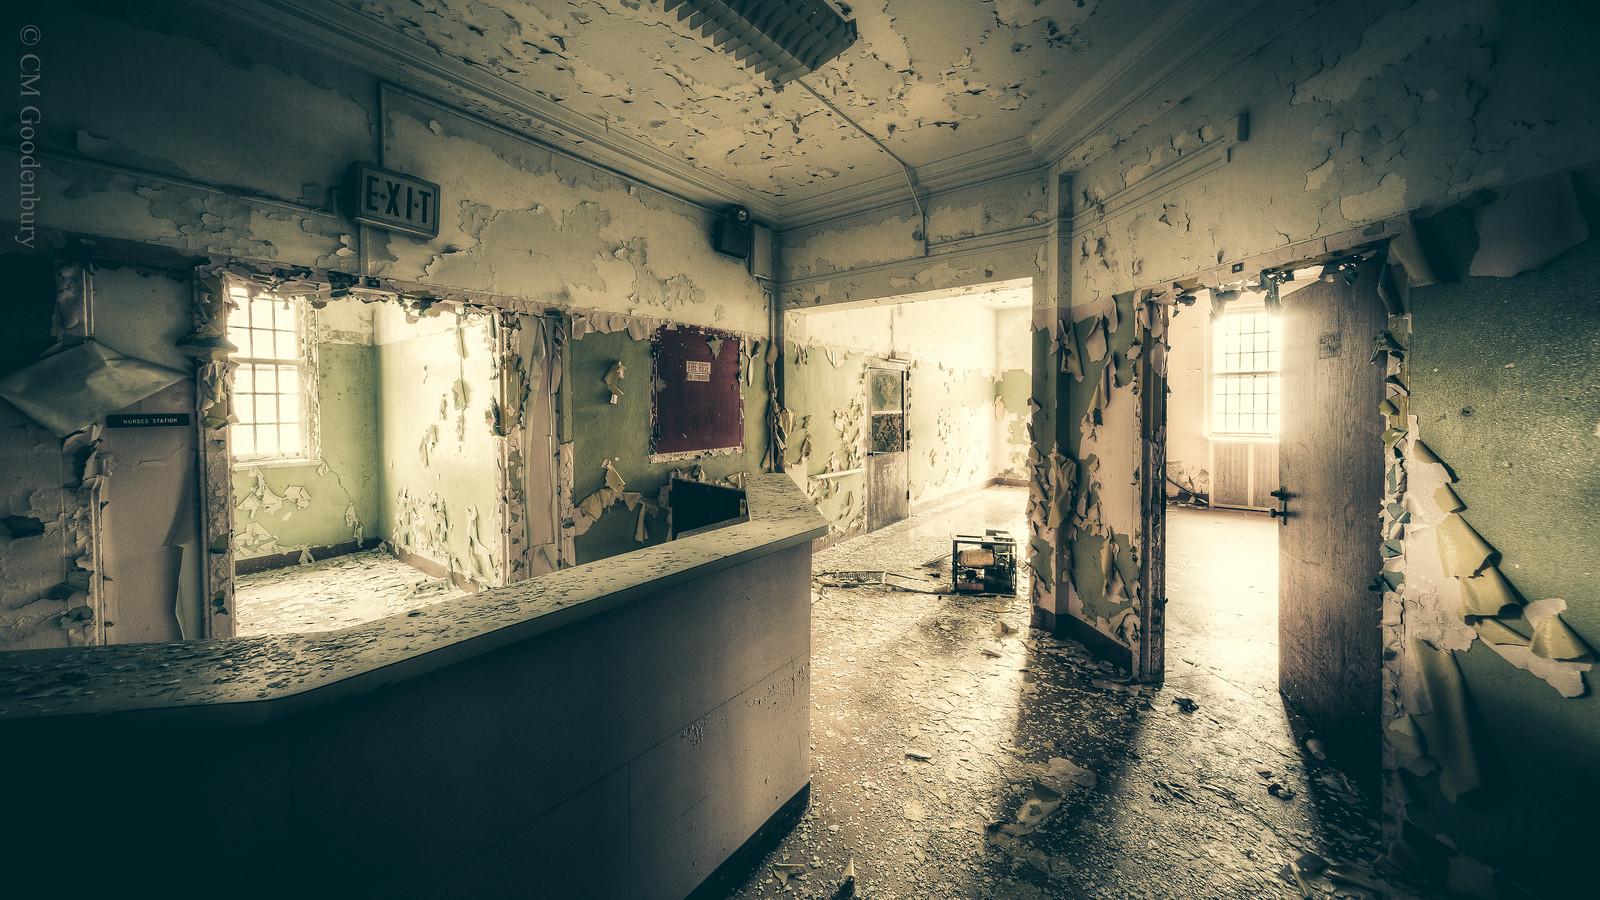 nurses 39 station in an abandoned insane asylum i love the. Black Bedroom Furniture Sets. Home Design Ideas